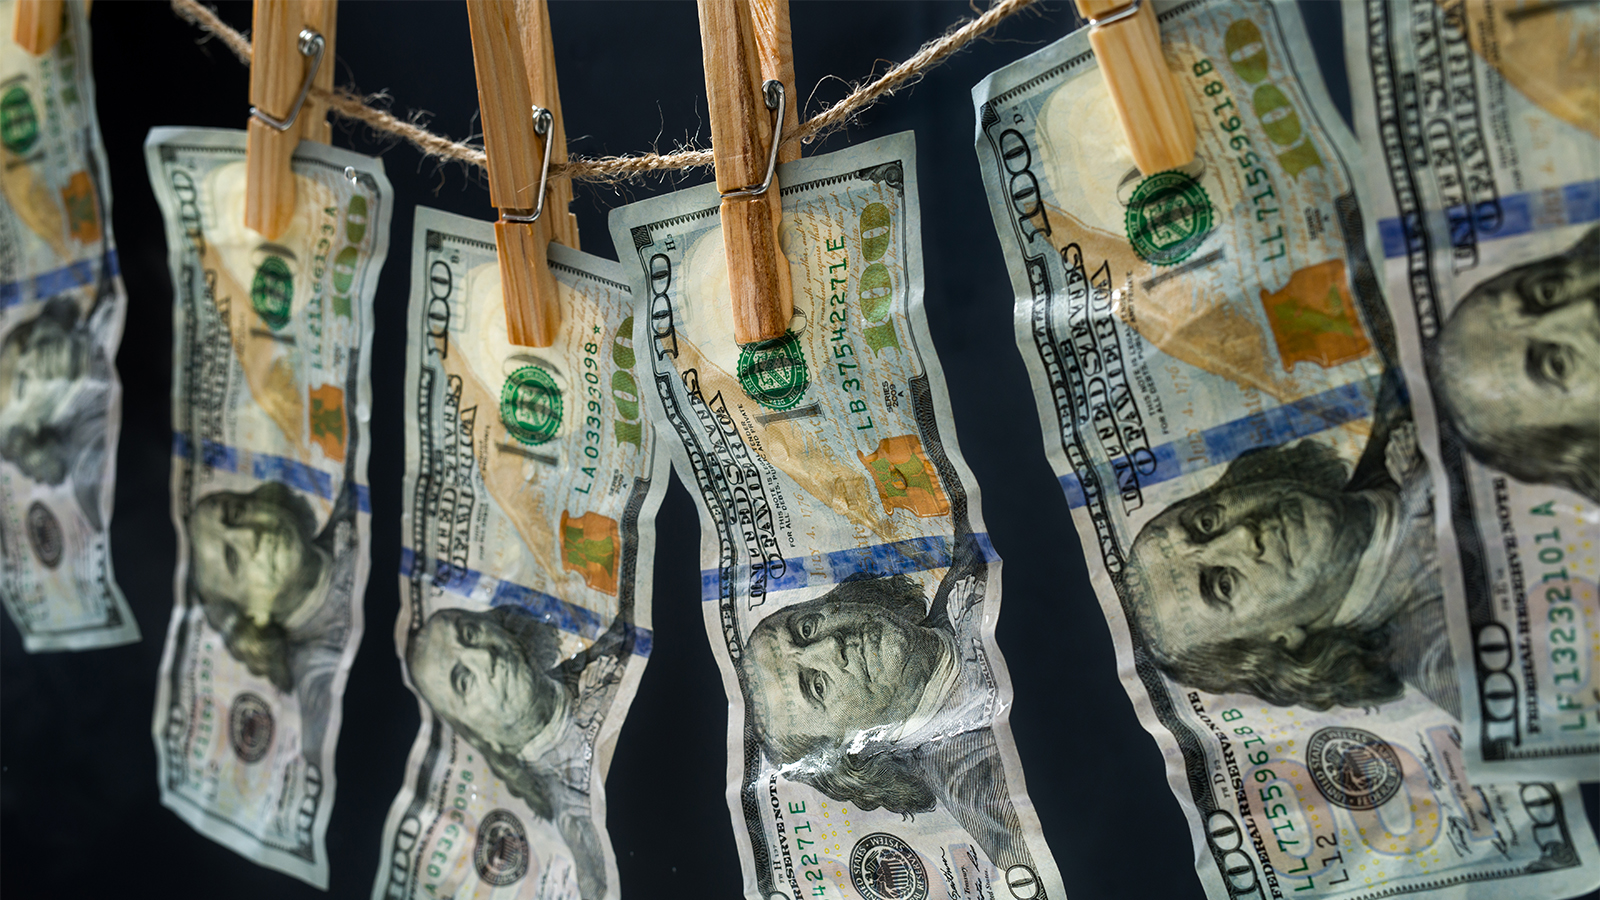 Money-laundering Methods | HowStuffWorks